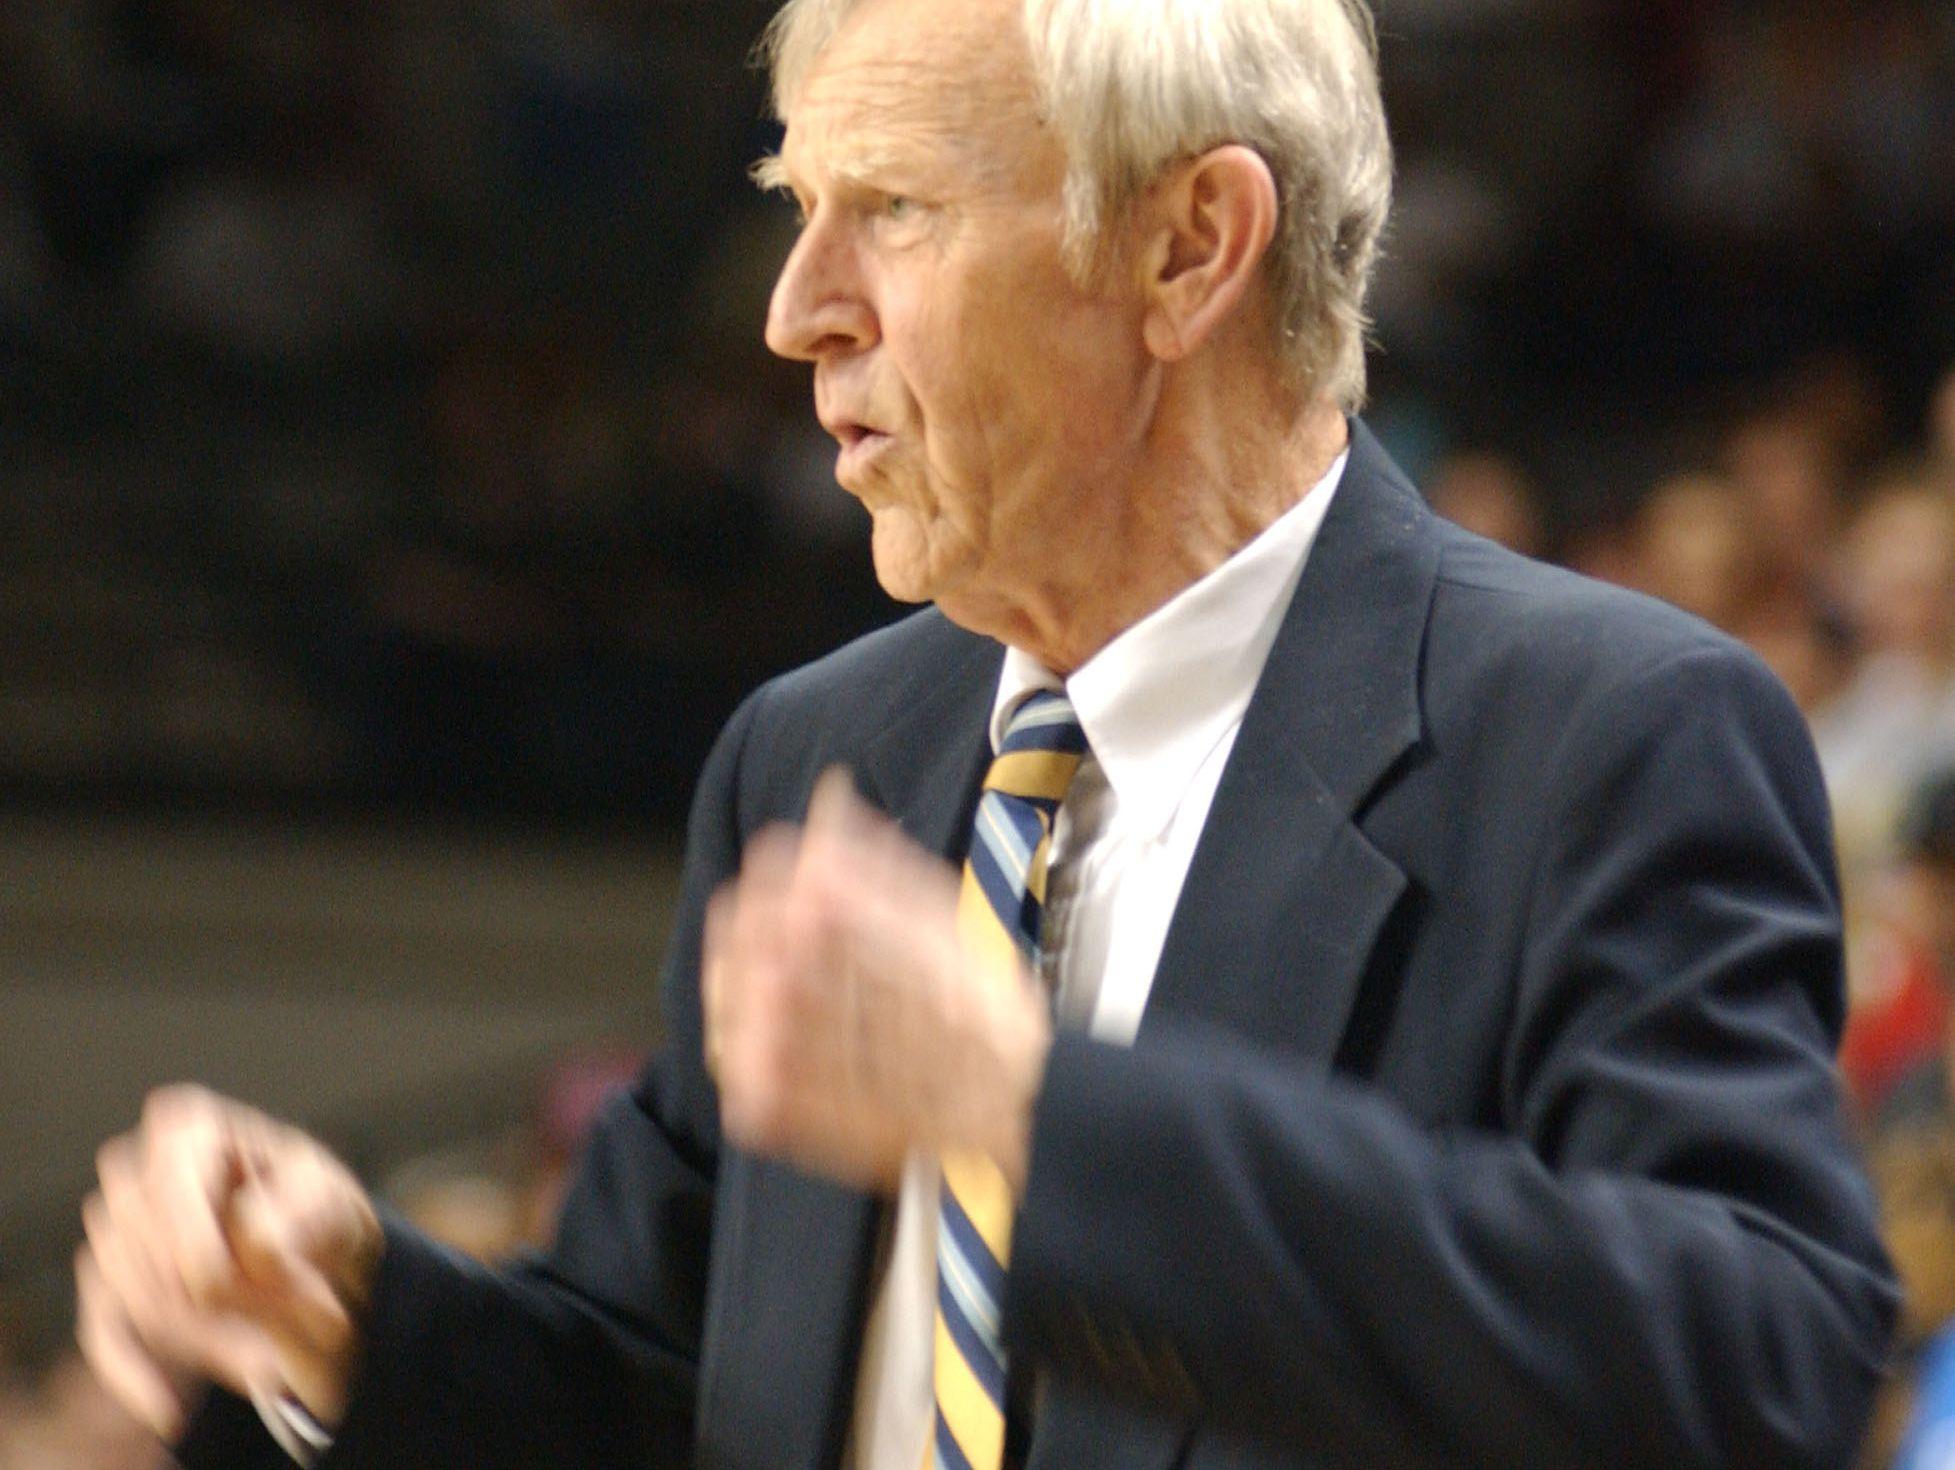 Former Robert E. Lee coach Paul Hatcher in this 2006 photo.